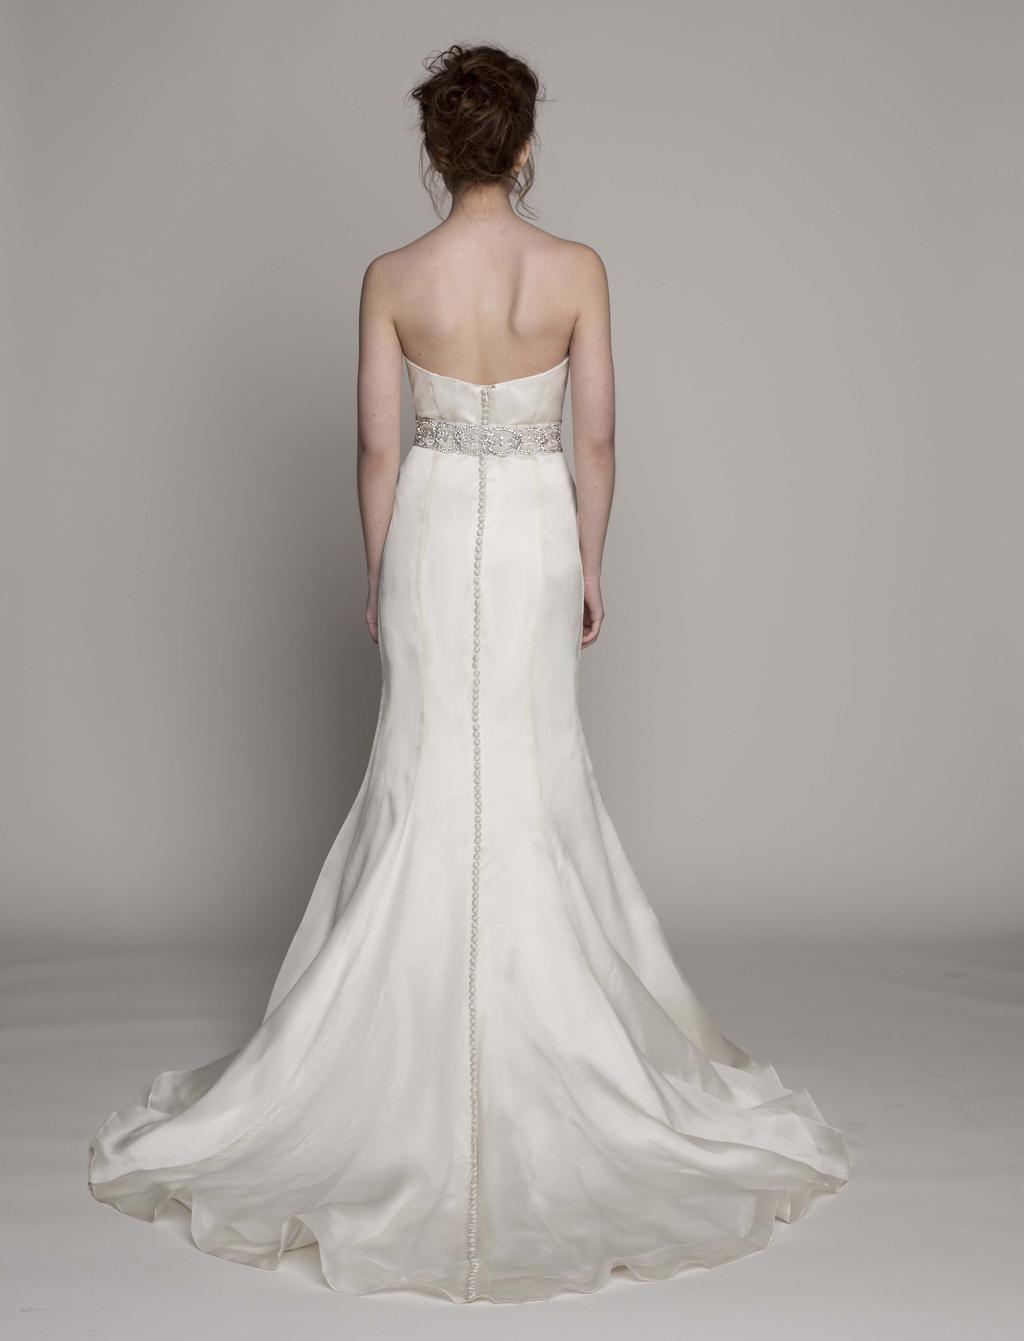 Kelly-faetanini-wedding-dress-2014-spring-bridal-gown-collection-devan.full